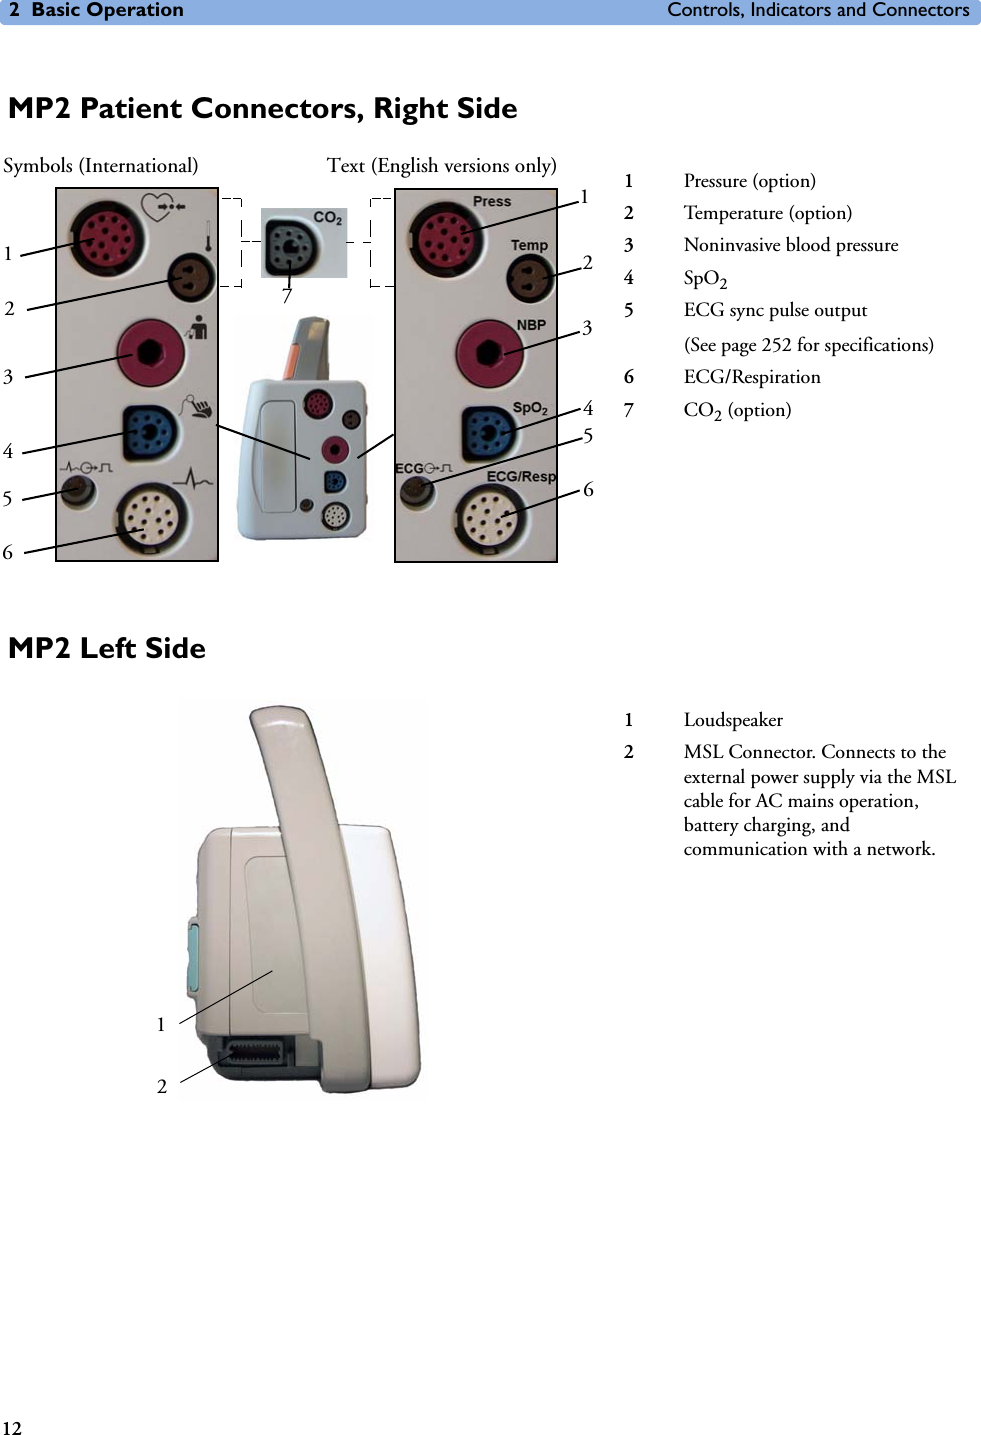 Philips Medical Systems North America SRRBV1 Short Range